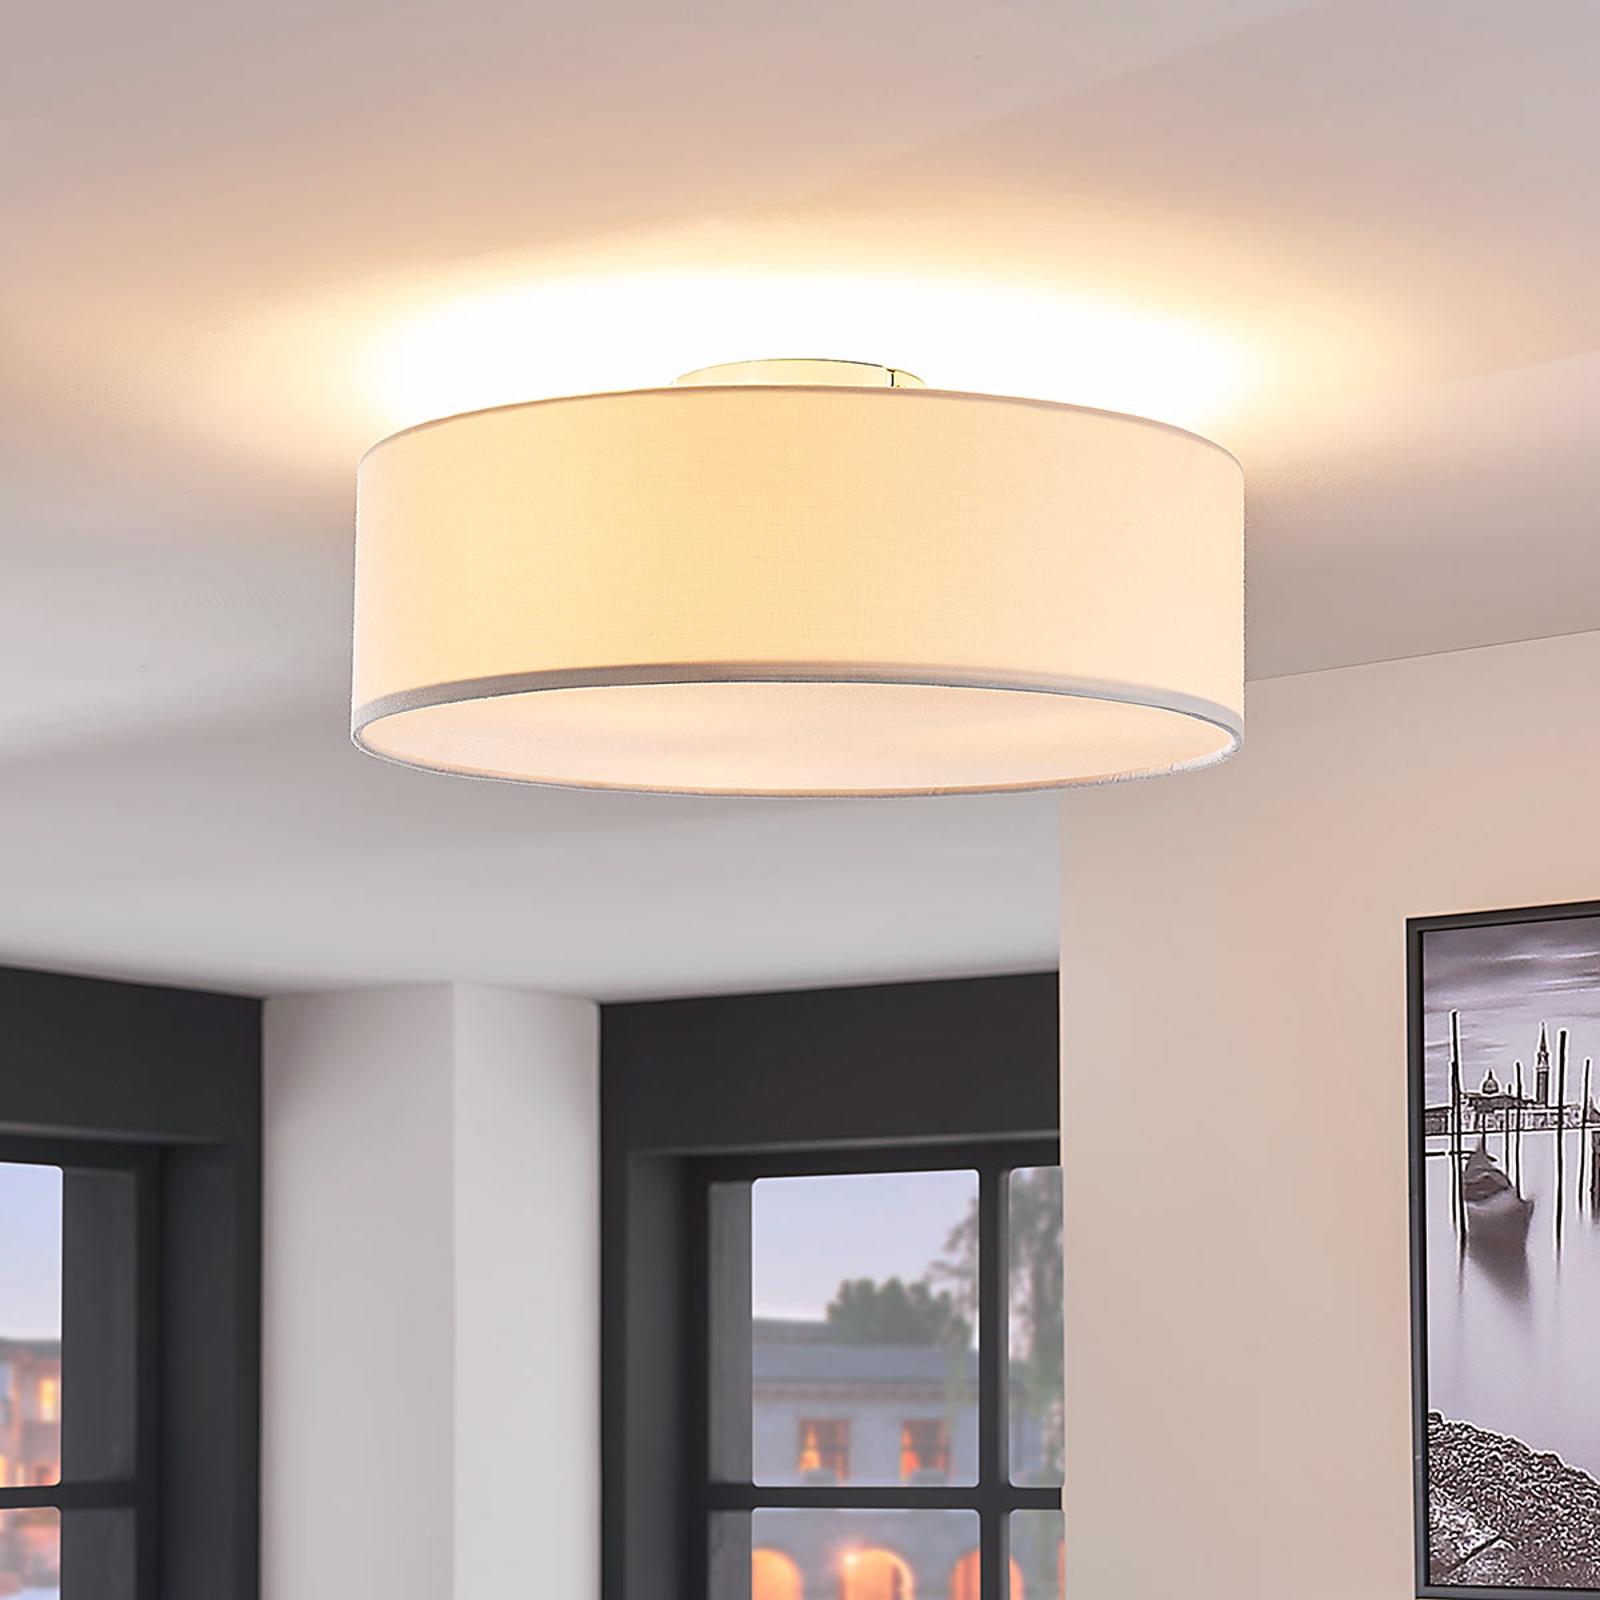 Plafondlamp Sebatin van stof, crèmekleurig